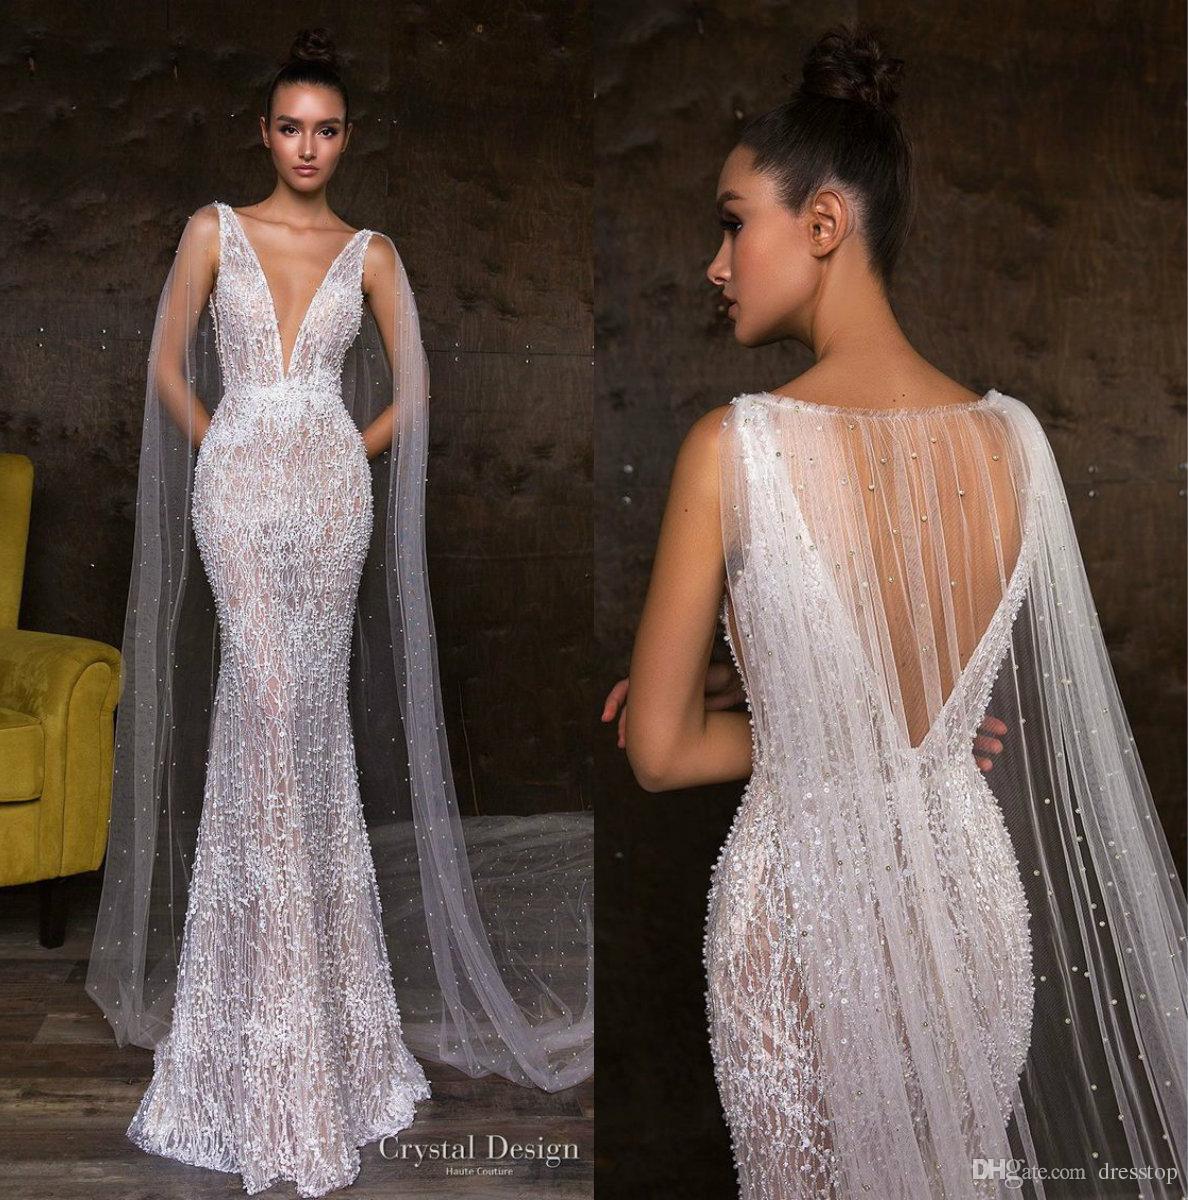 Fabulous Mermaid Wedding Dresses With Pearls Cape V Neck Beading Lace Bridal Gown Vestidos Backless Dubai Beach Wedding Dress Plus Size